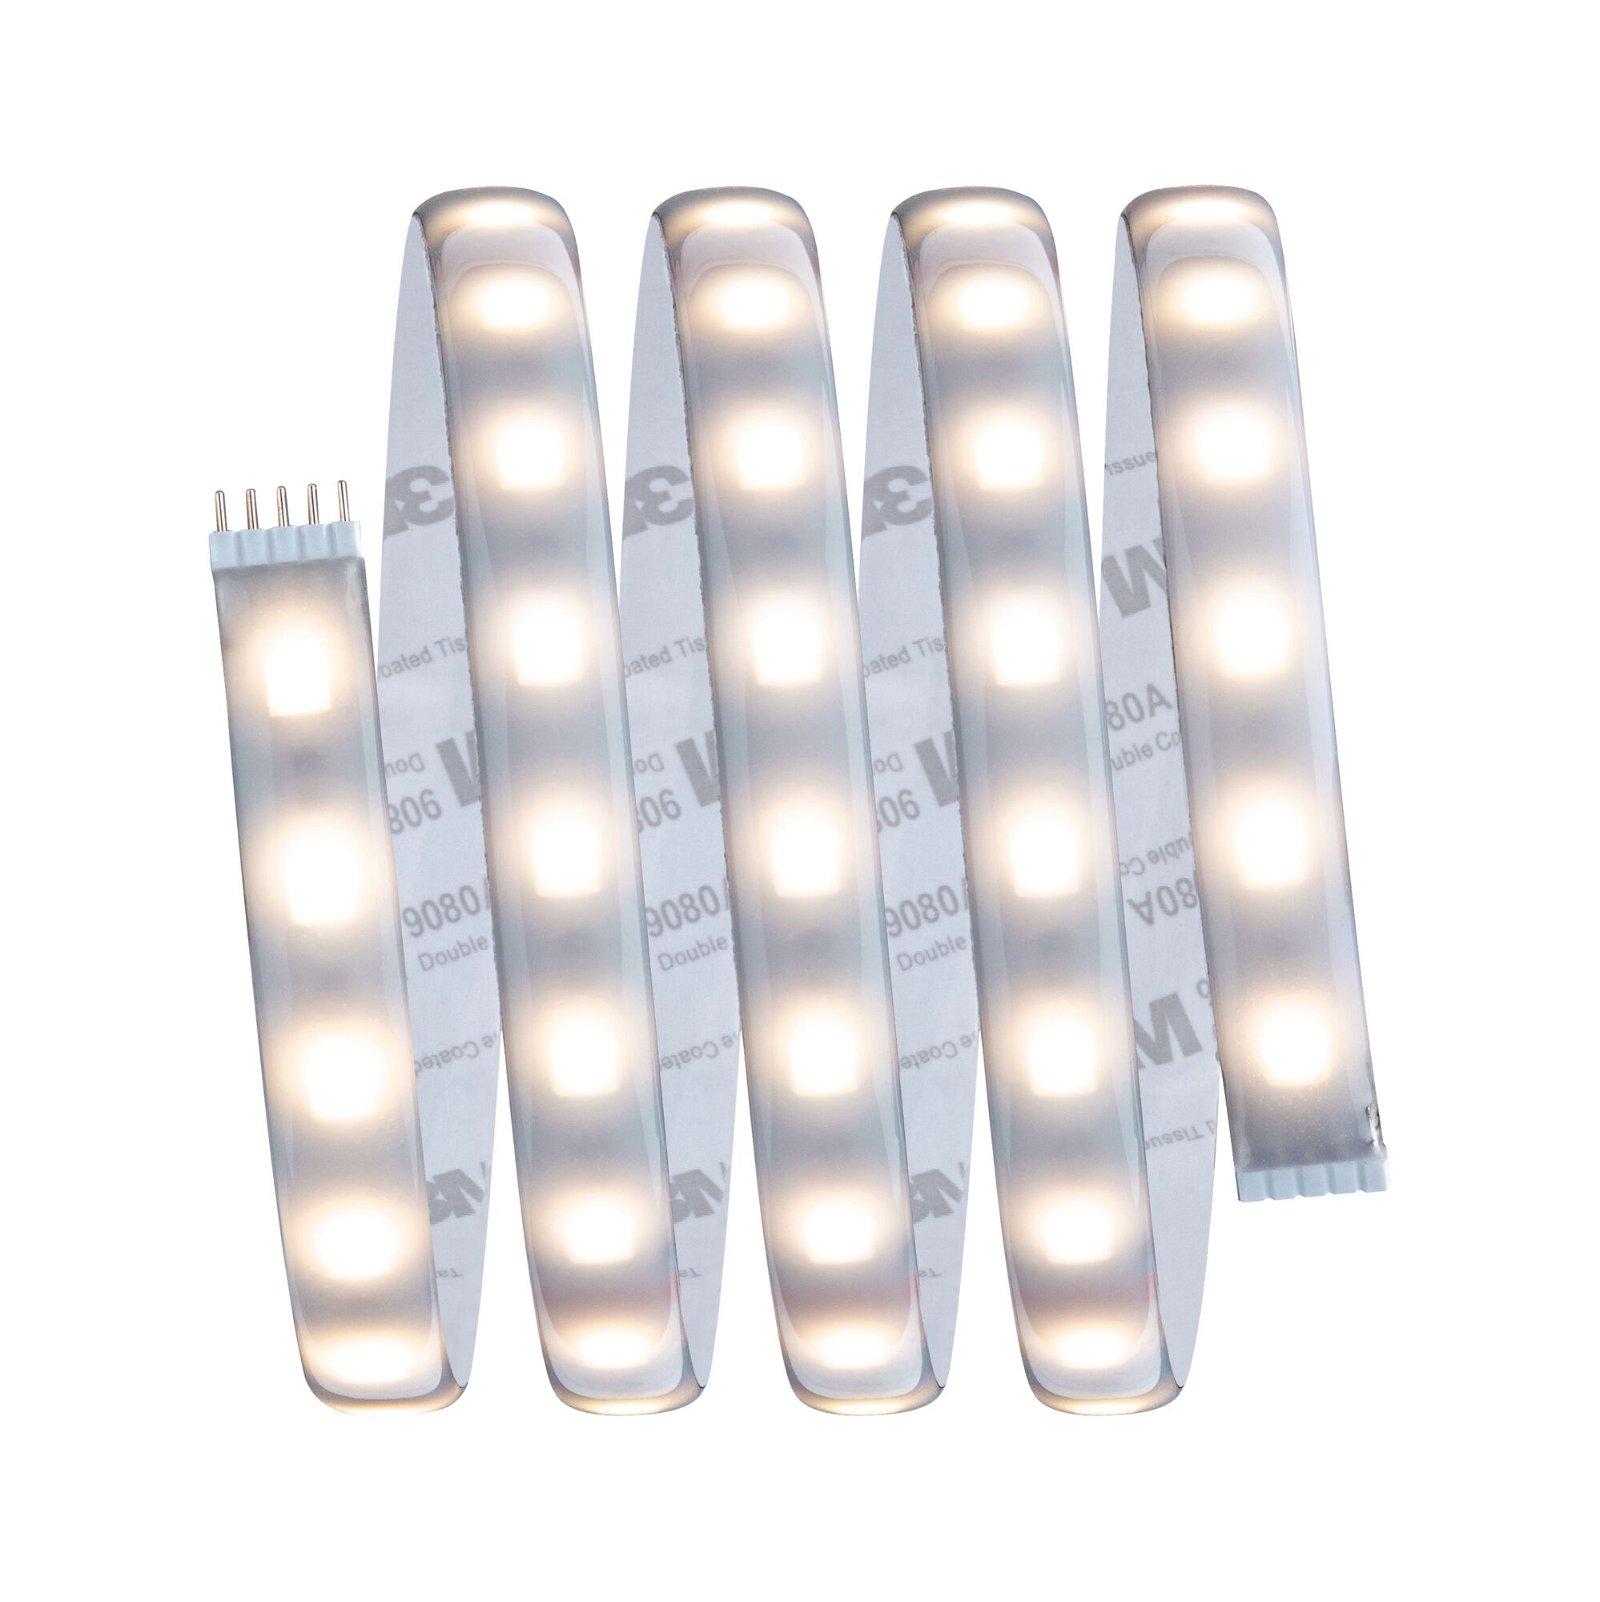 MaxLED 500 Strip LED RGBW 1,5m recouvert 18W 750lm RGBW 36VA